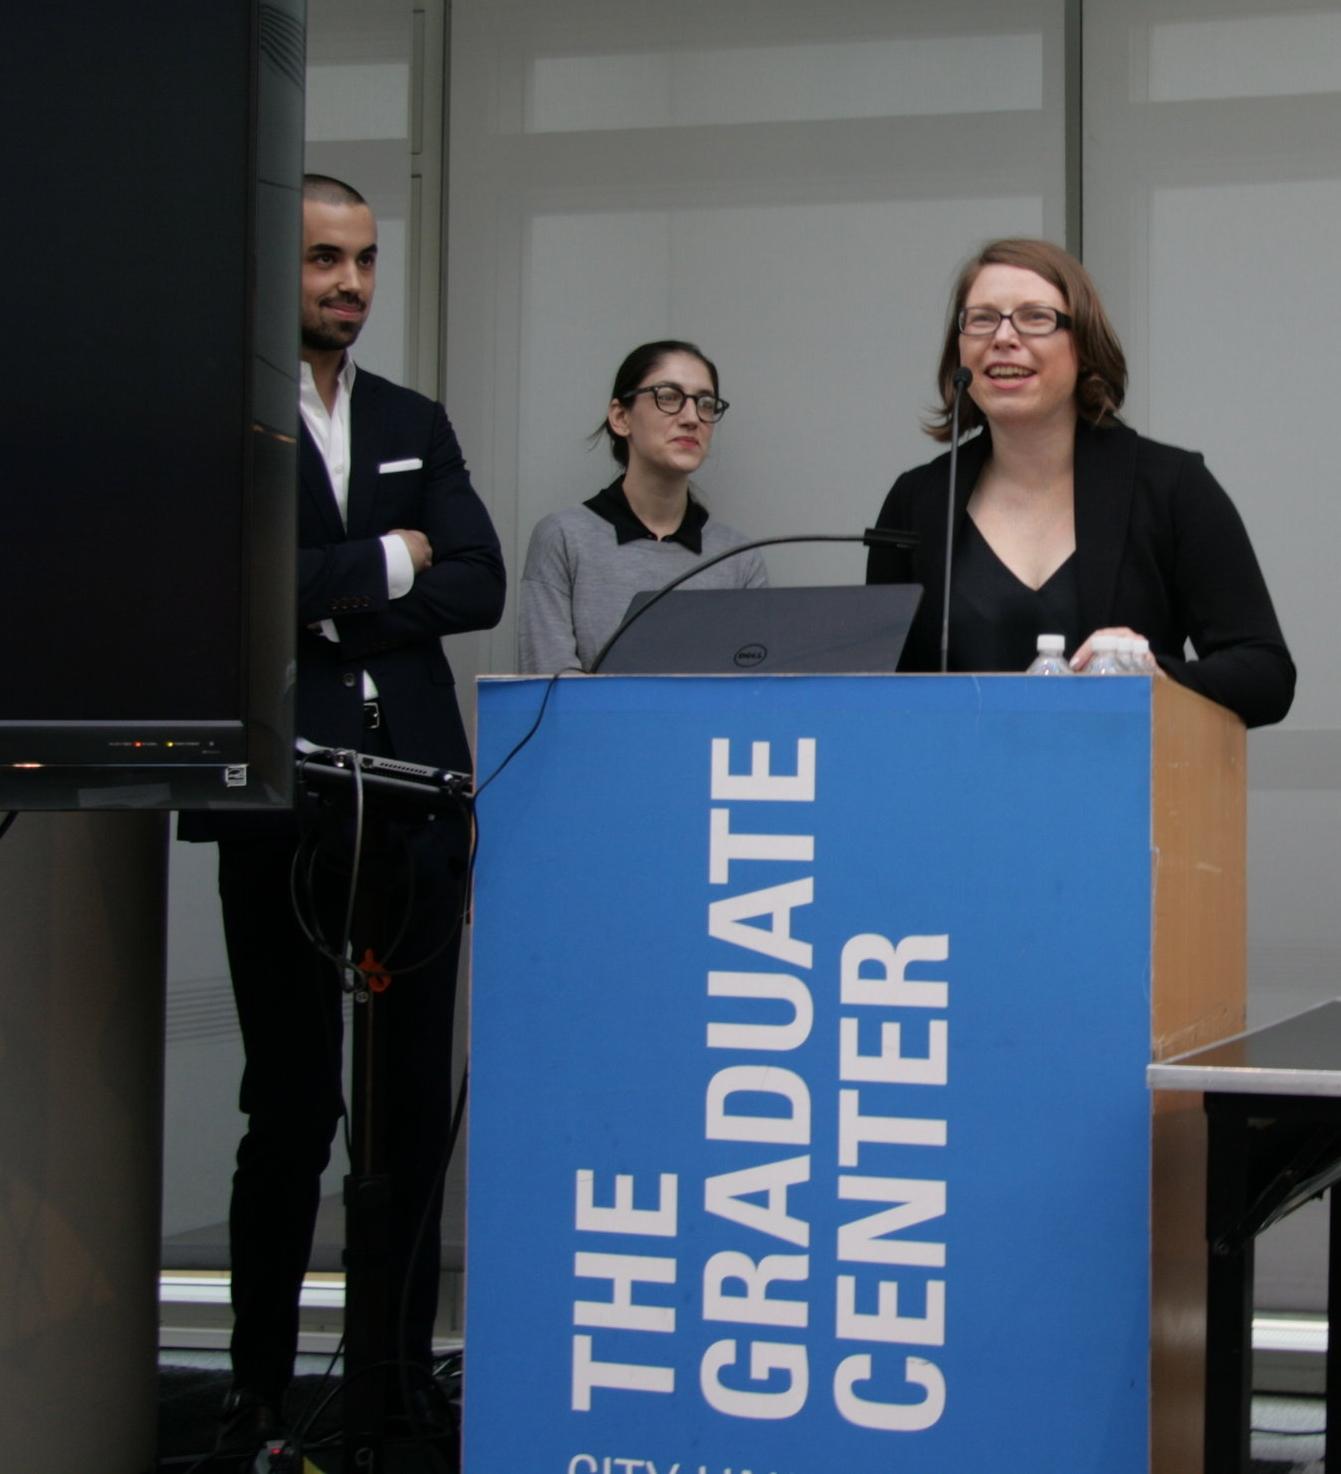 Opening remarks. From left: Patryk Tomaszewski, Rachel Wetzler, and Alise Tifentale. Photo: courtesy Barbora Bartunkova.